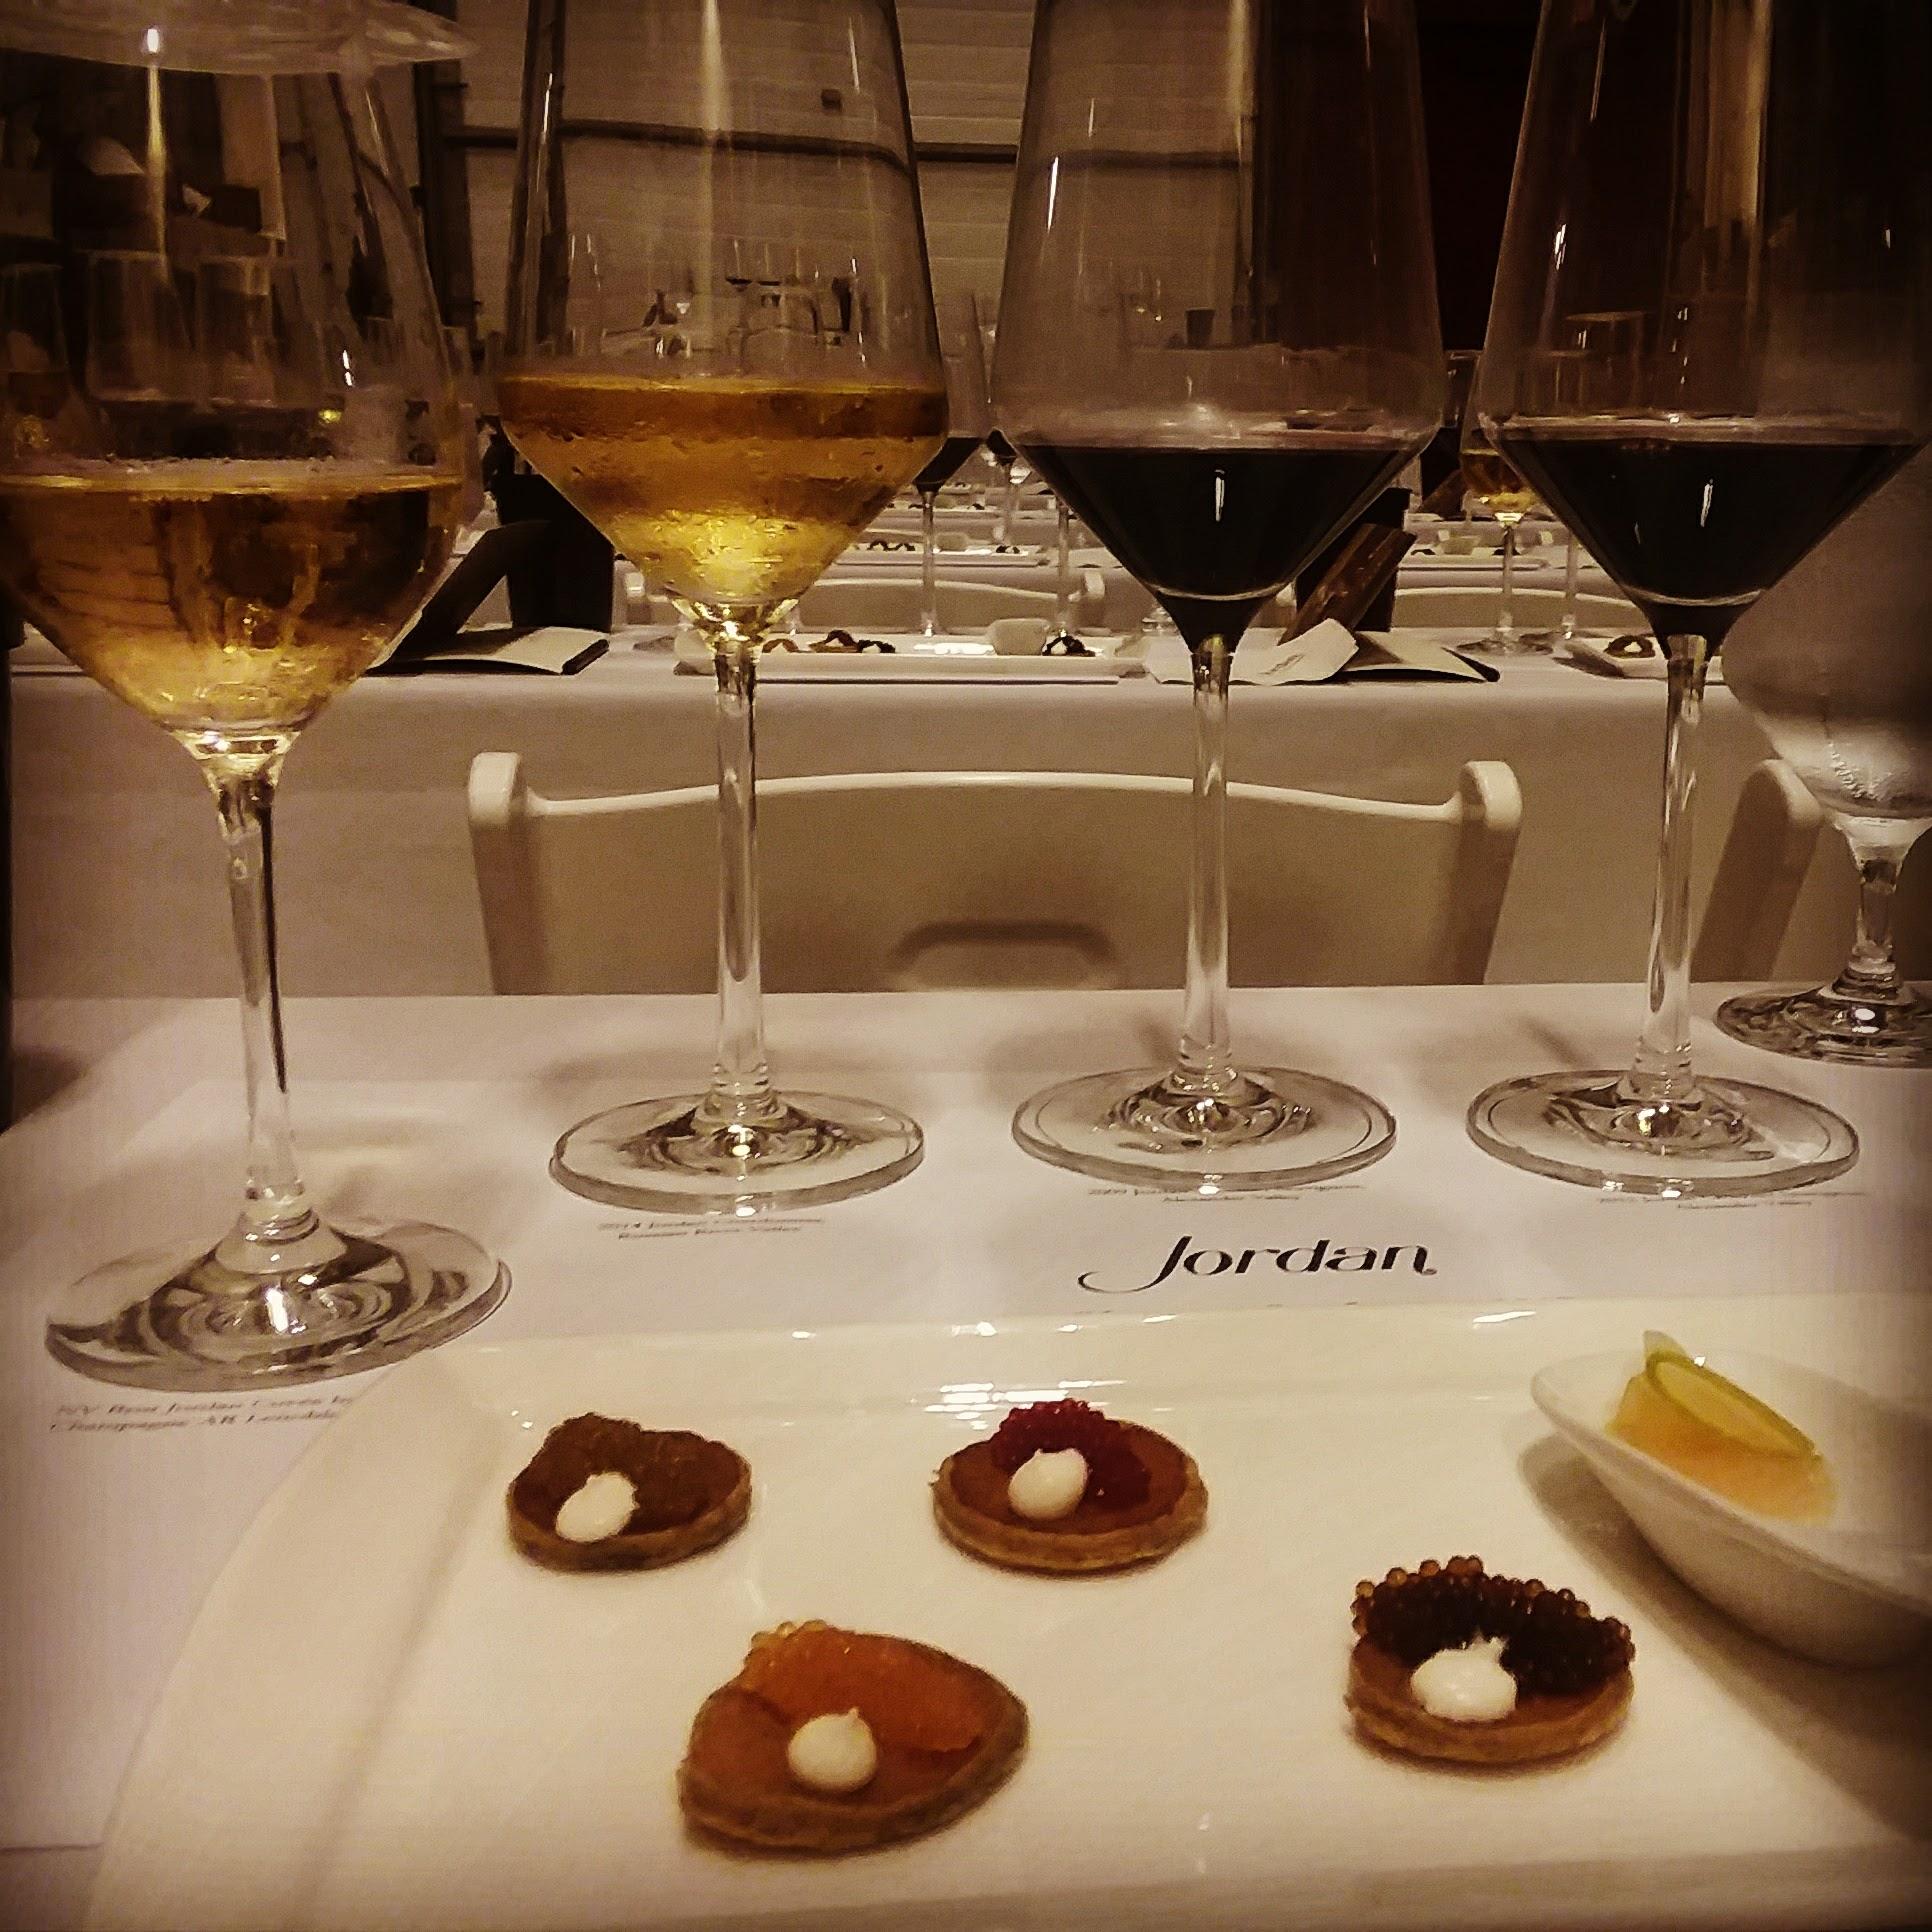 Successful test run for Jordan Winery's new caviar & wine